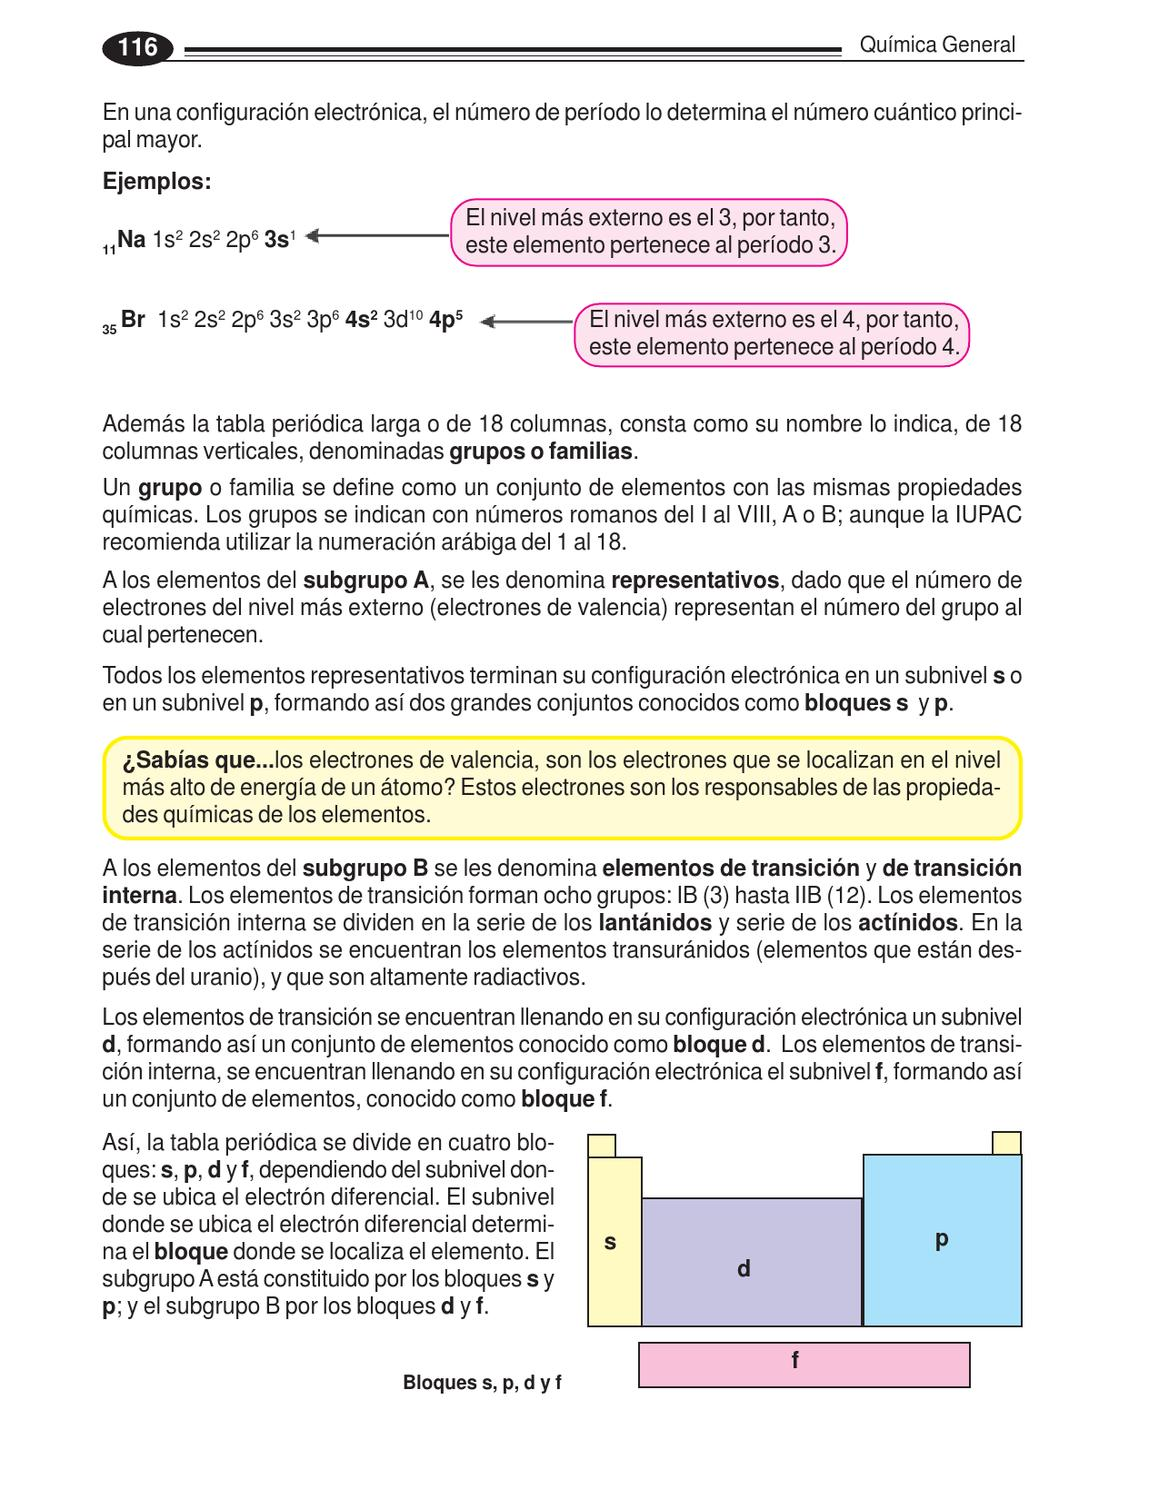 Libro de quimica by edson orozco bedugo issuu urtaz Image collections